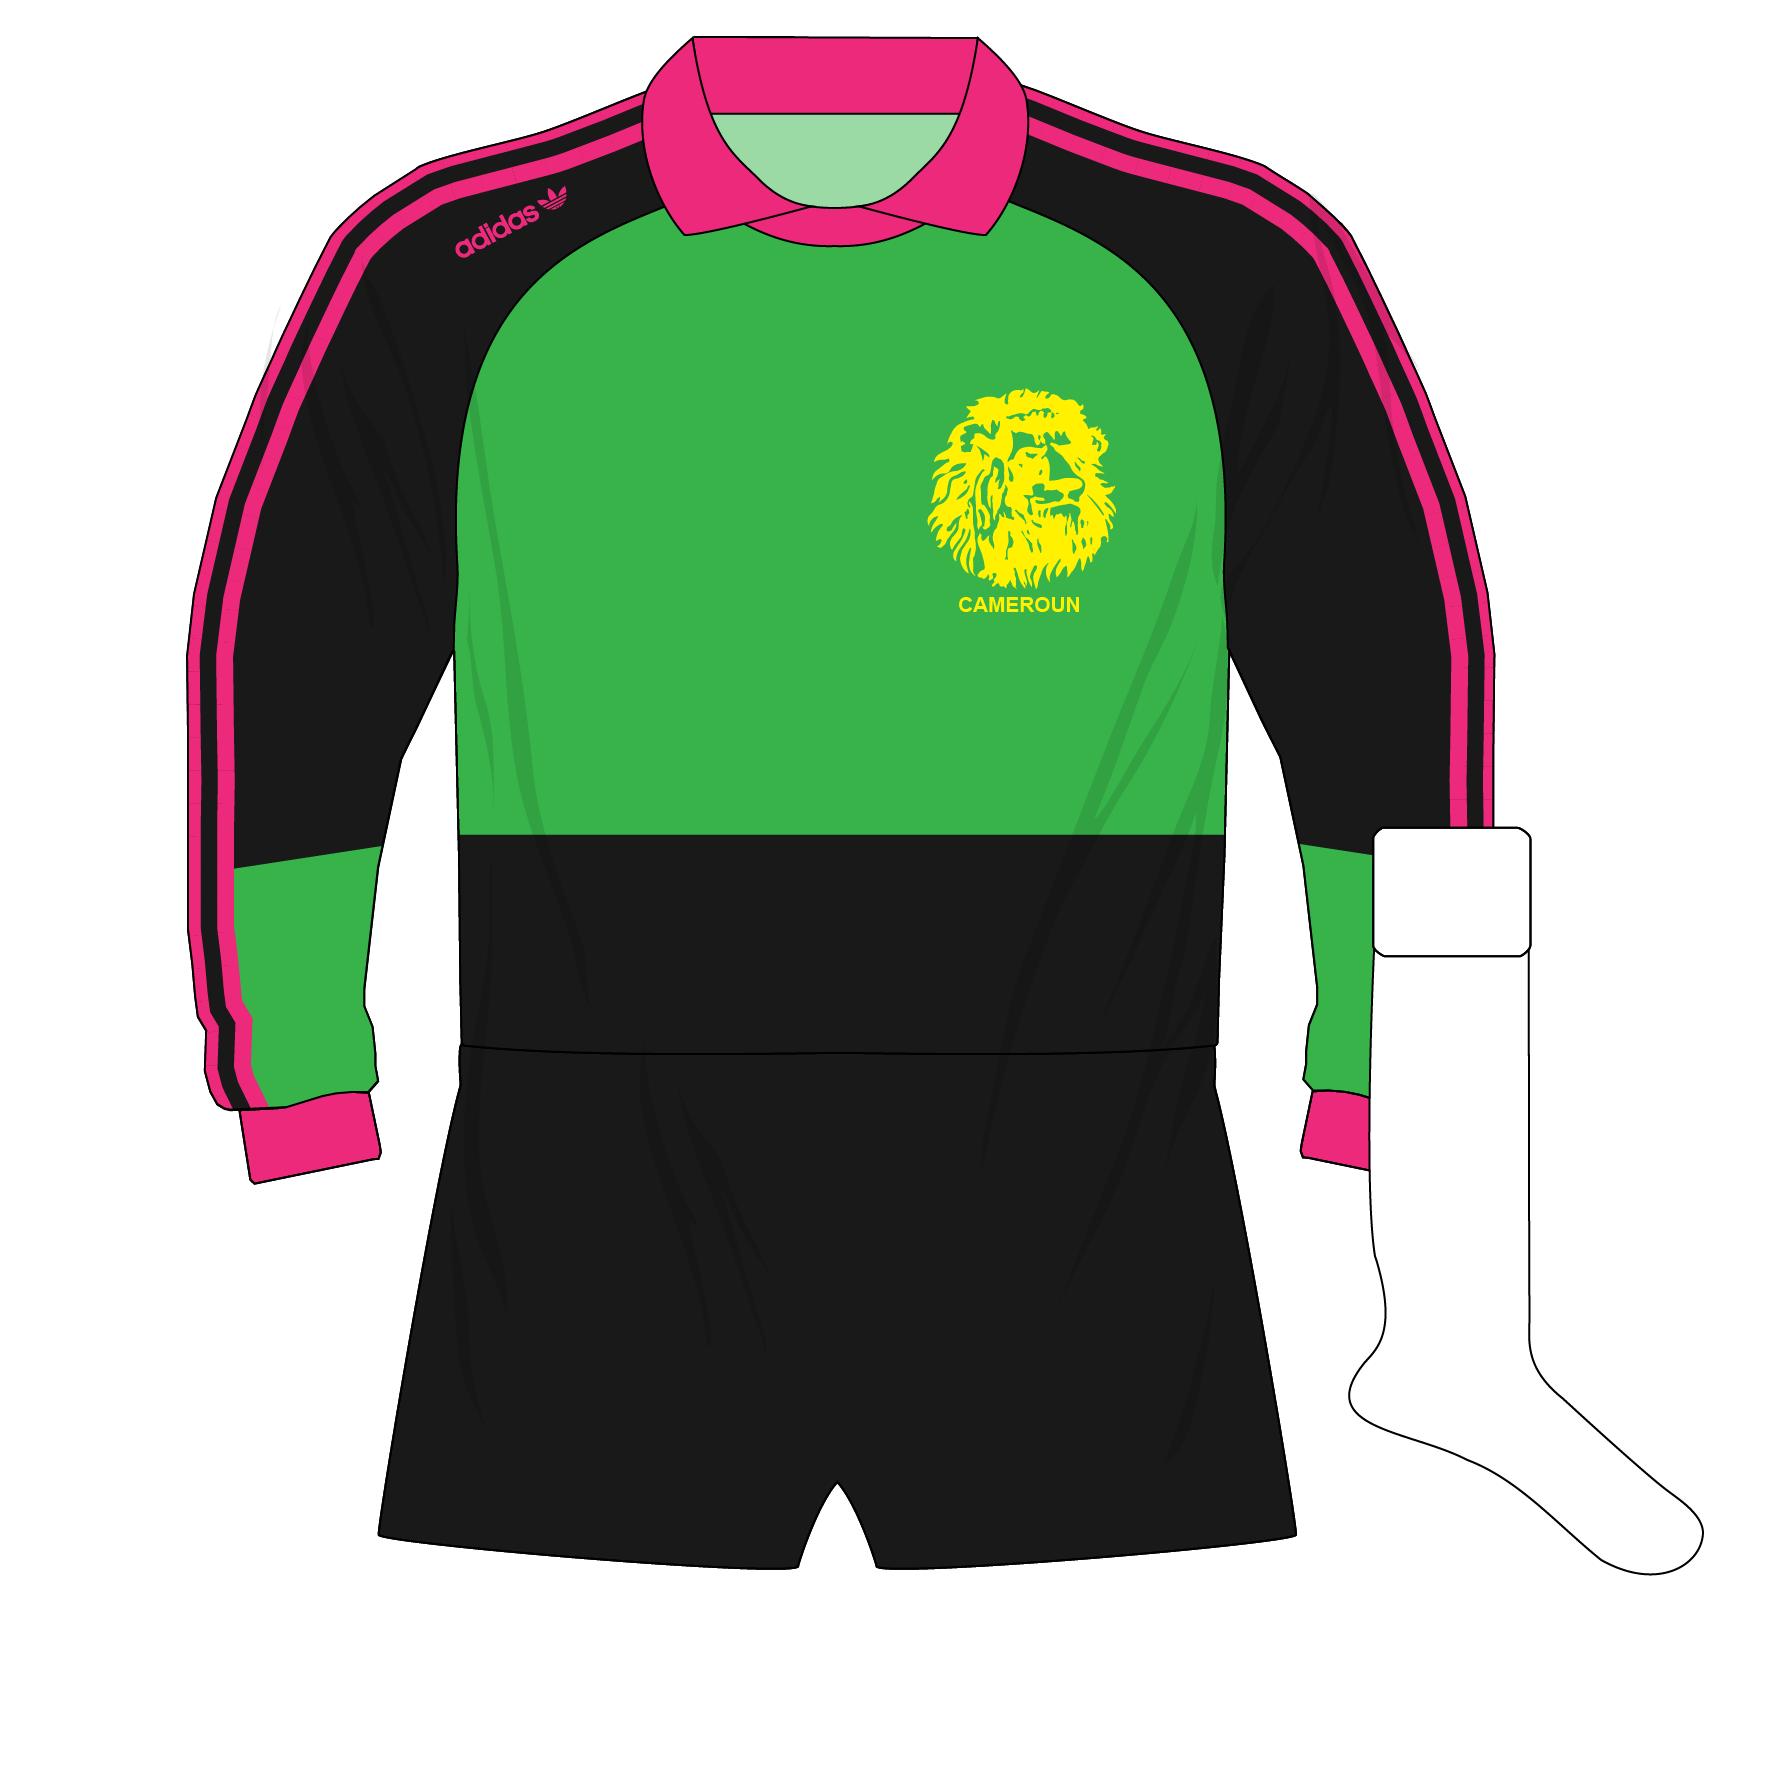 388f8c61bcaa The evolution of adidas goalkeeper shirt designs – Part 5 – Museum of  Jerseys